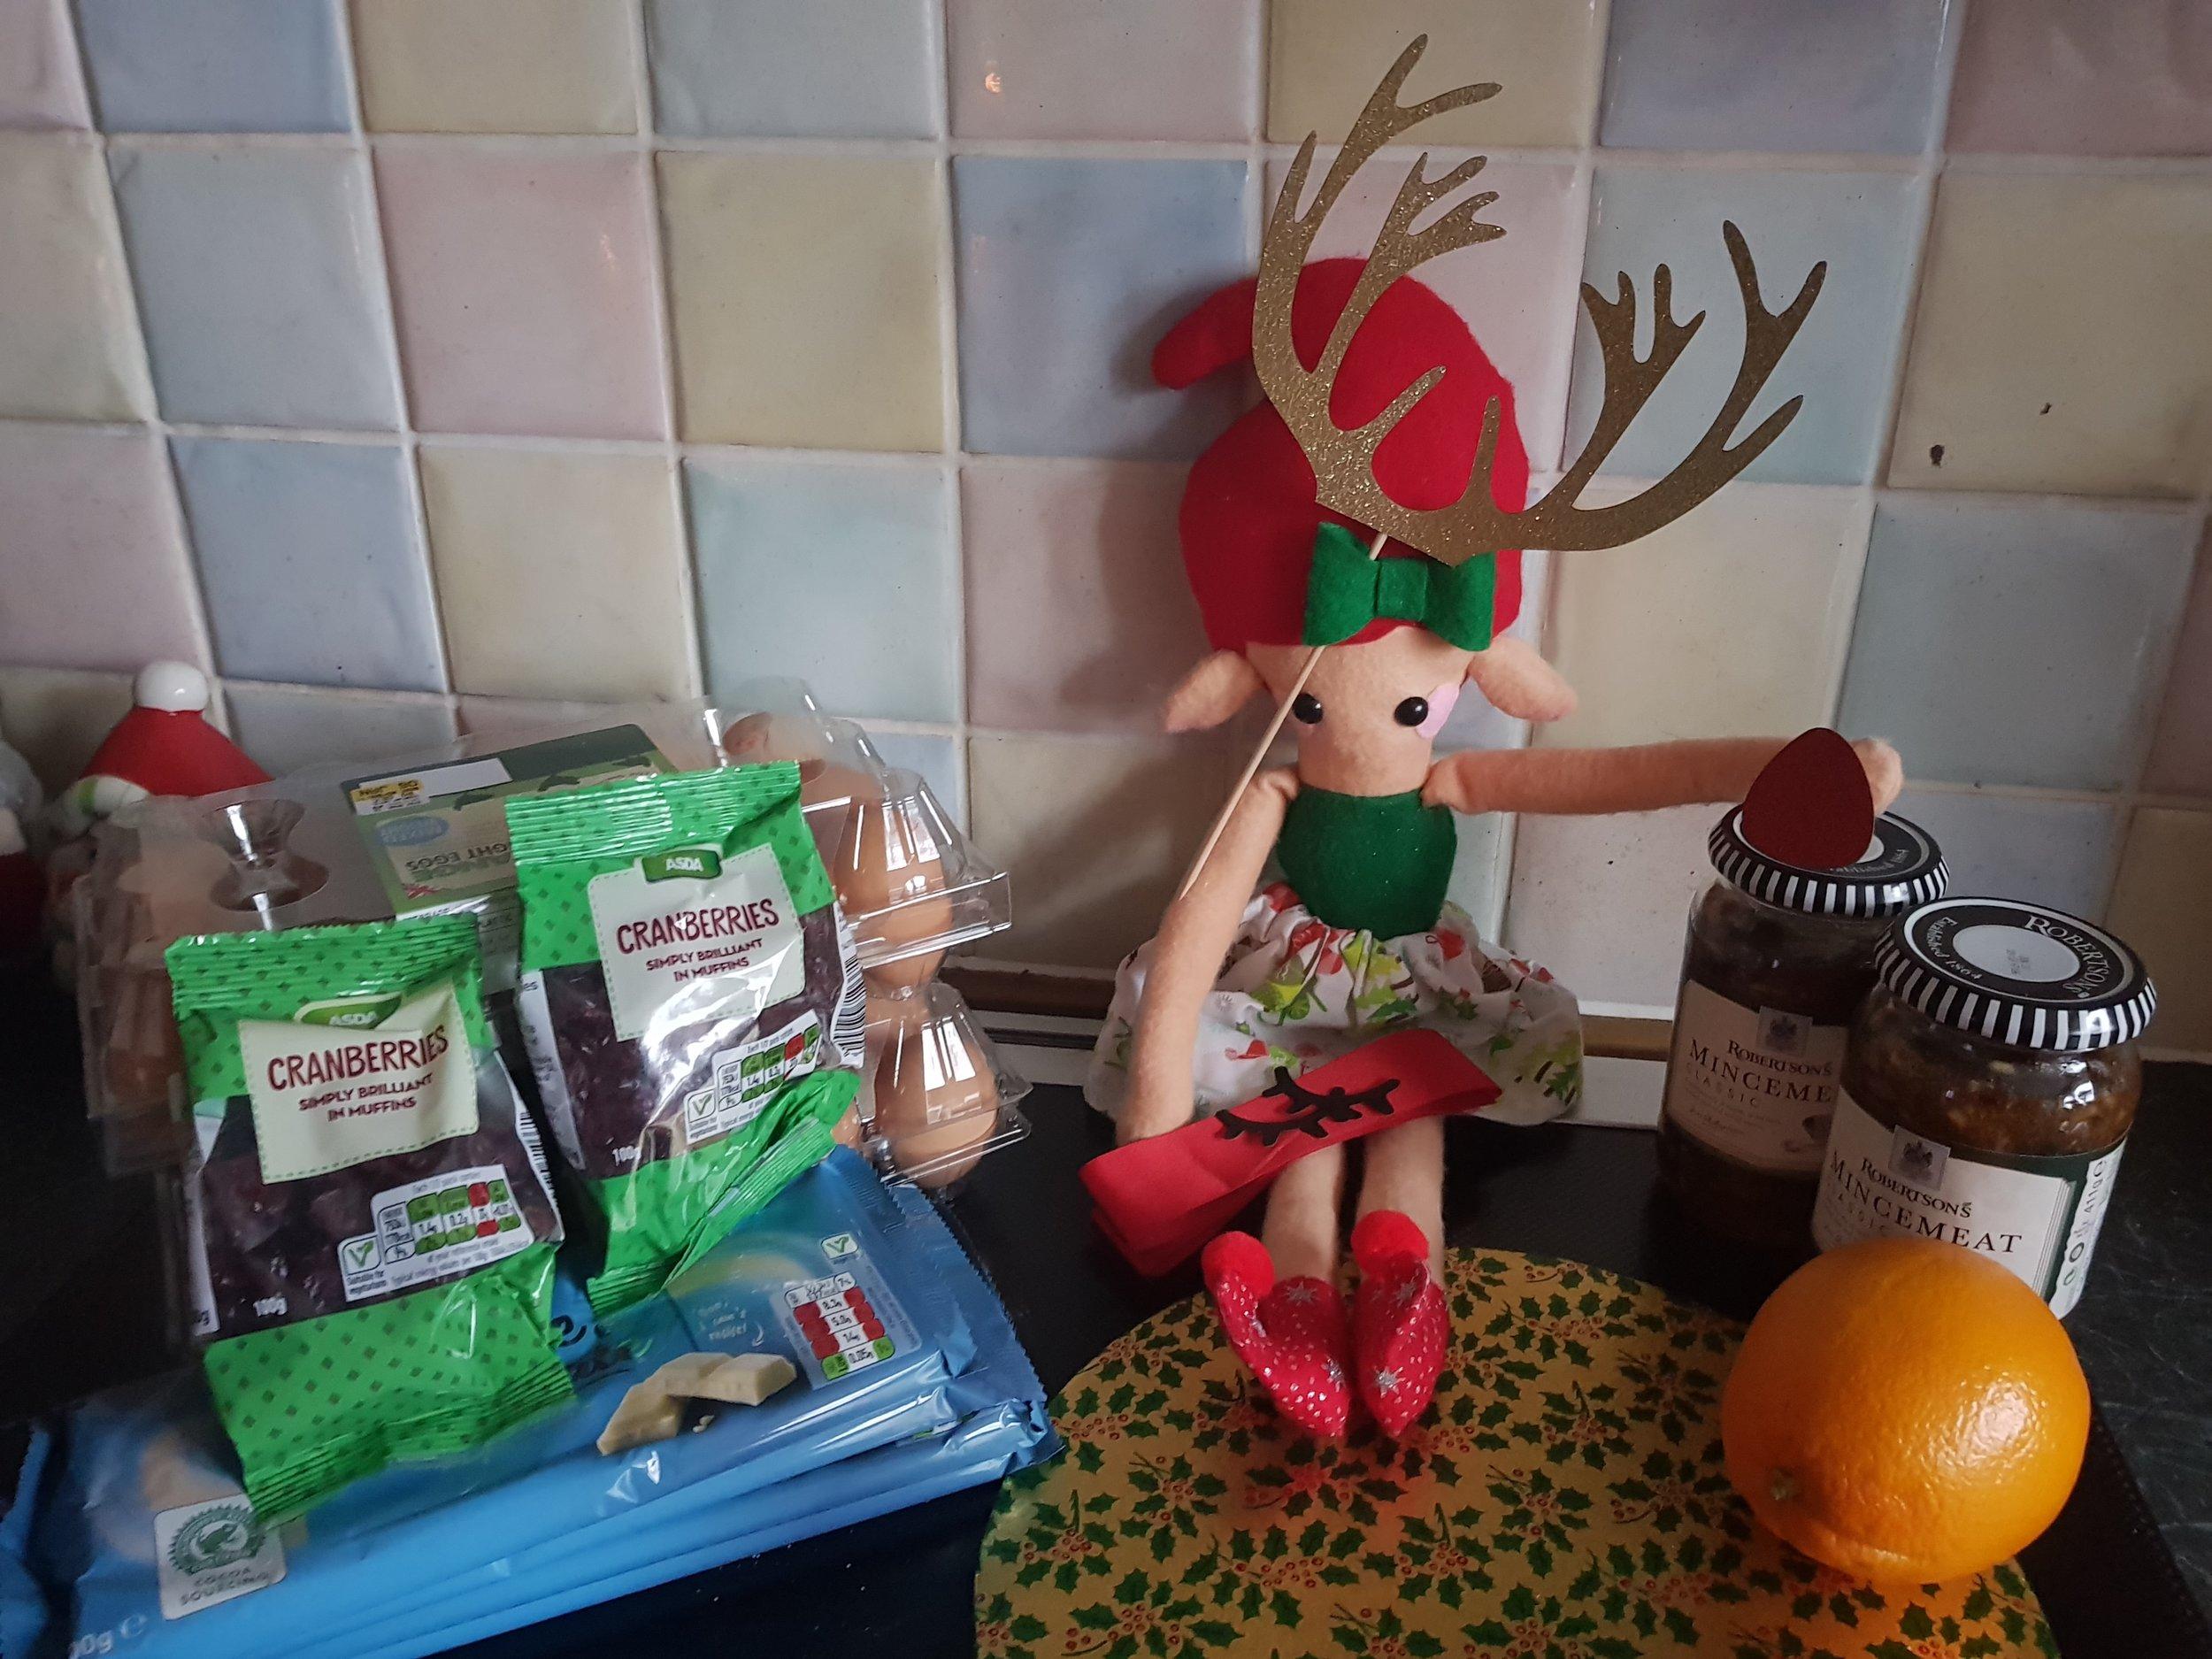 Elf on a Shelf December 23rd Baking Day